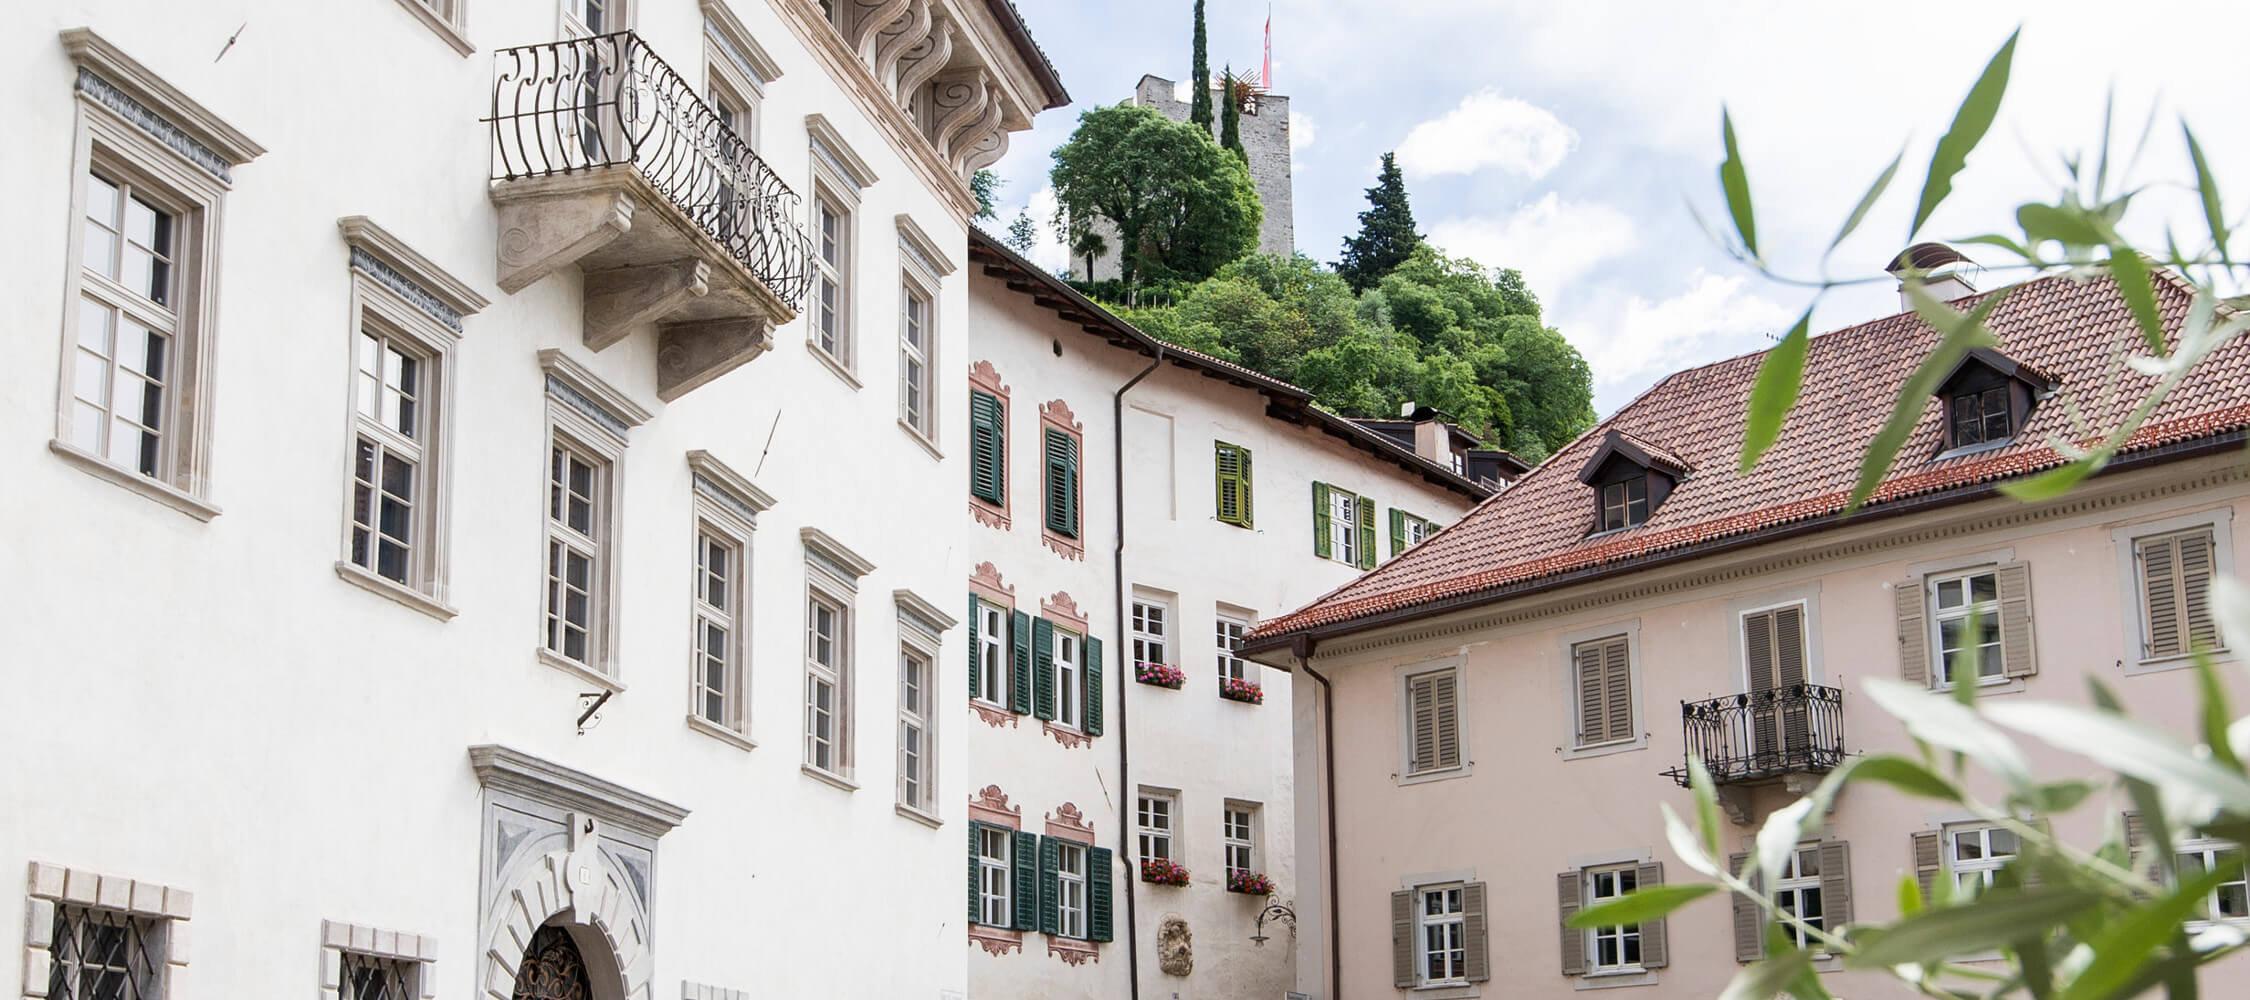 Italien-Trentino_Suedtirol_Alto_Adige_Merano_Meran_Besichtigen_Kultur_Altstadt_Steinach_Kurverwaltung-Alex Filz_mgm01176kume_2250x1000